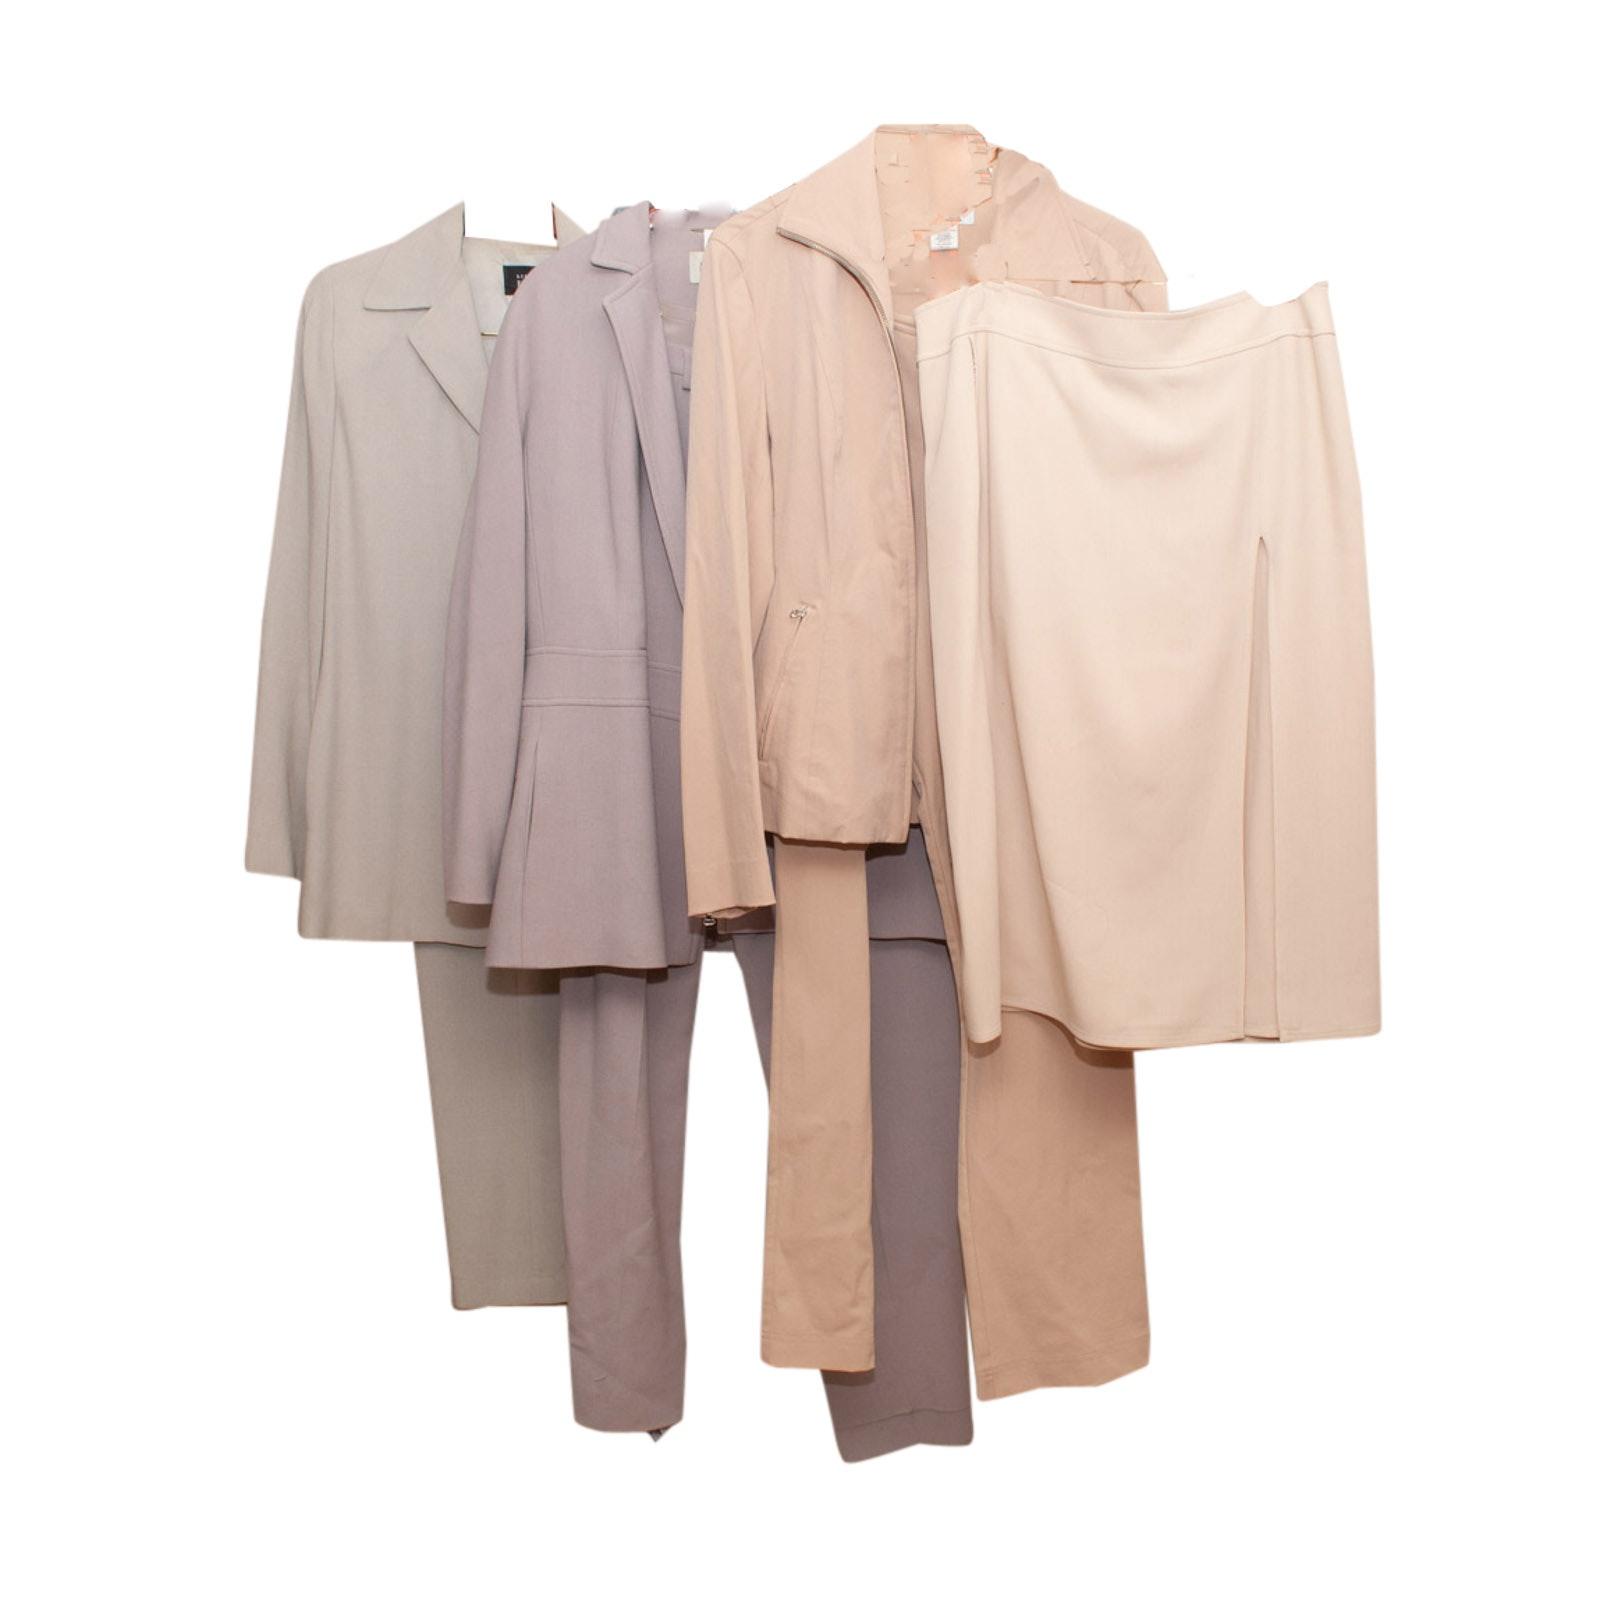 Designer Pant Suits Including Mondi, and AX Armani Exchange